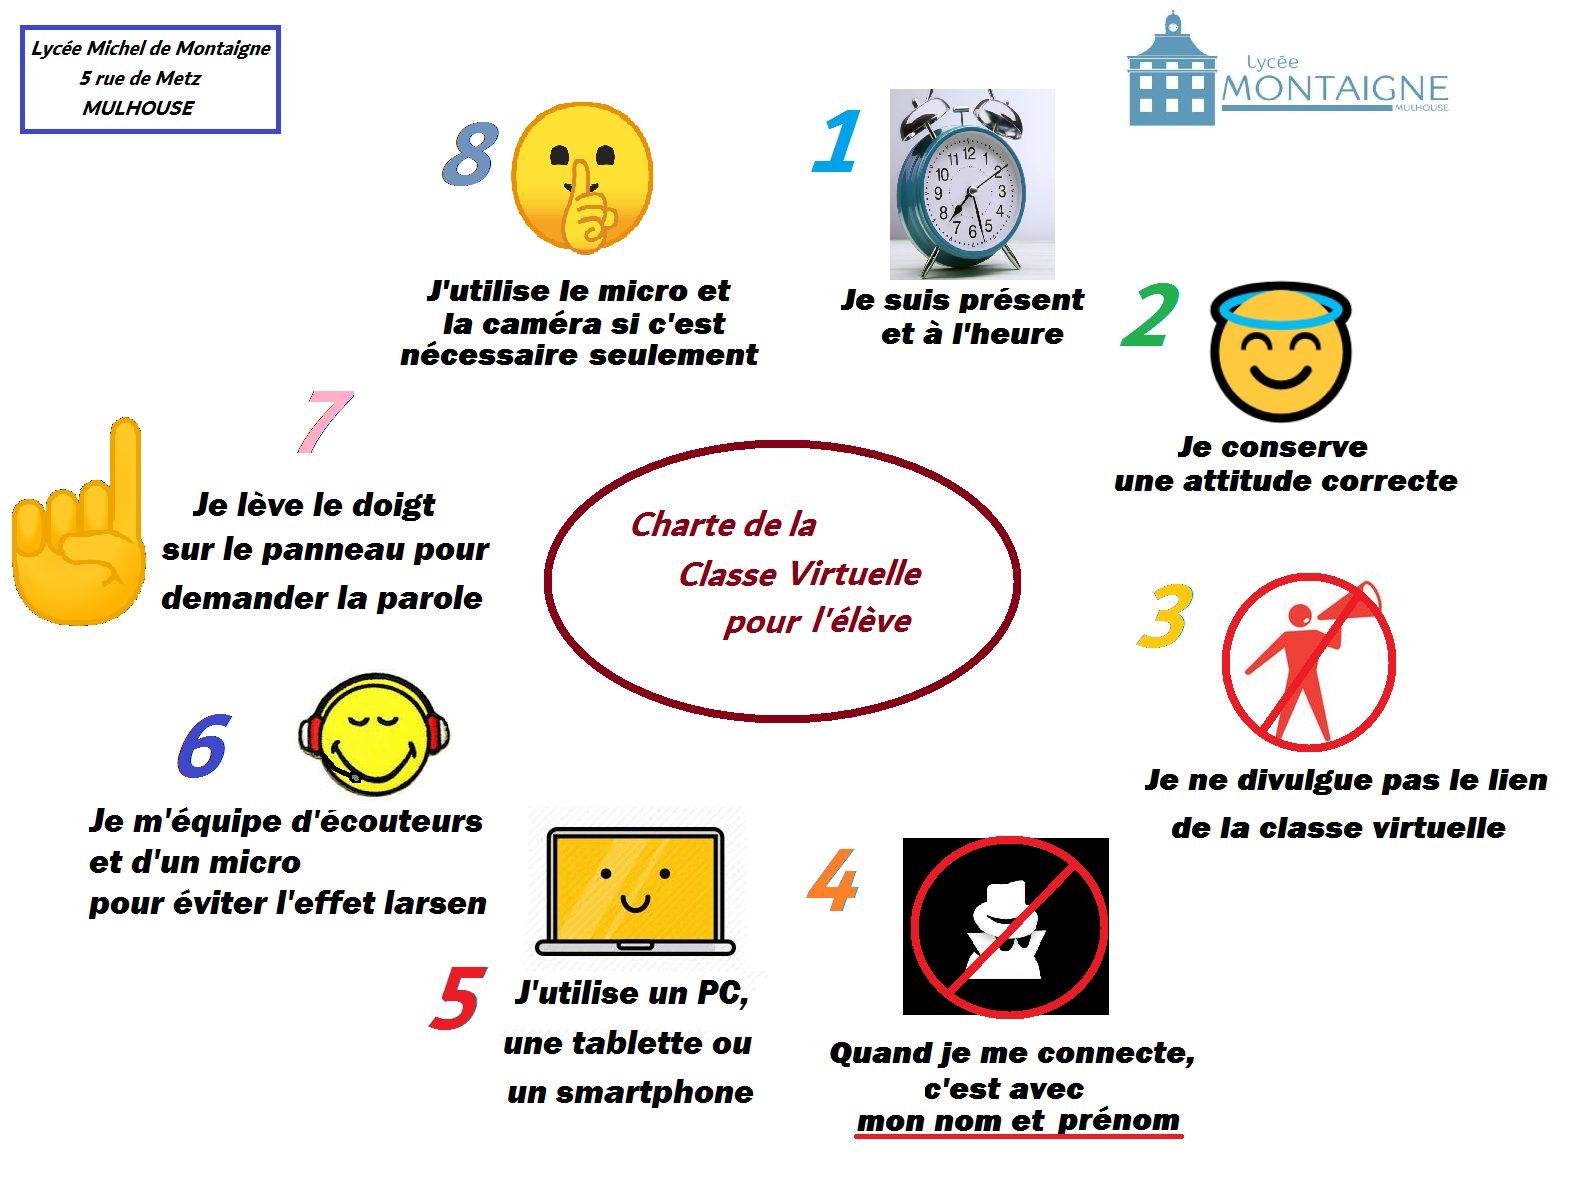 Charte CV3 doigt icone lycée.jpg